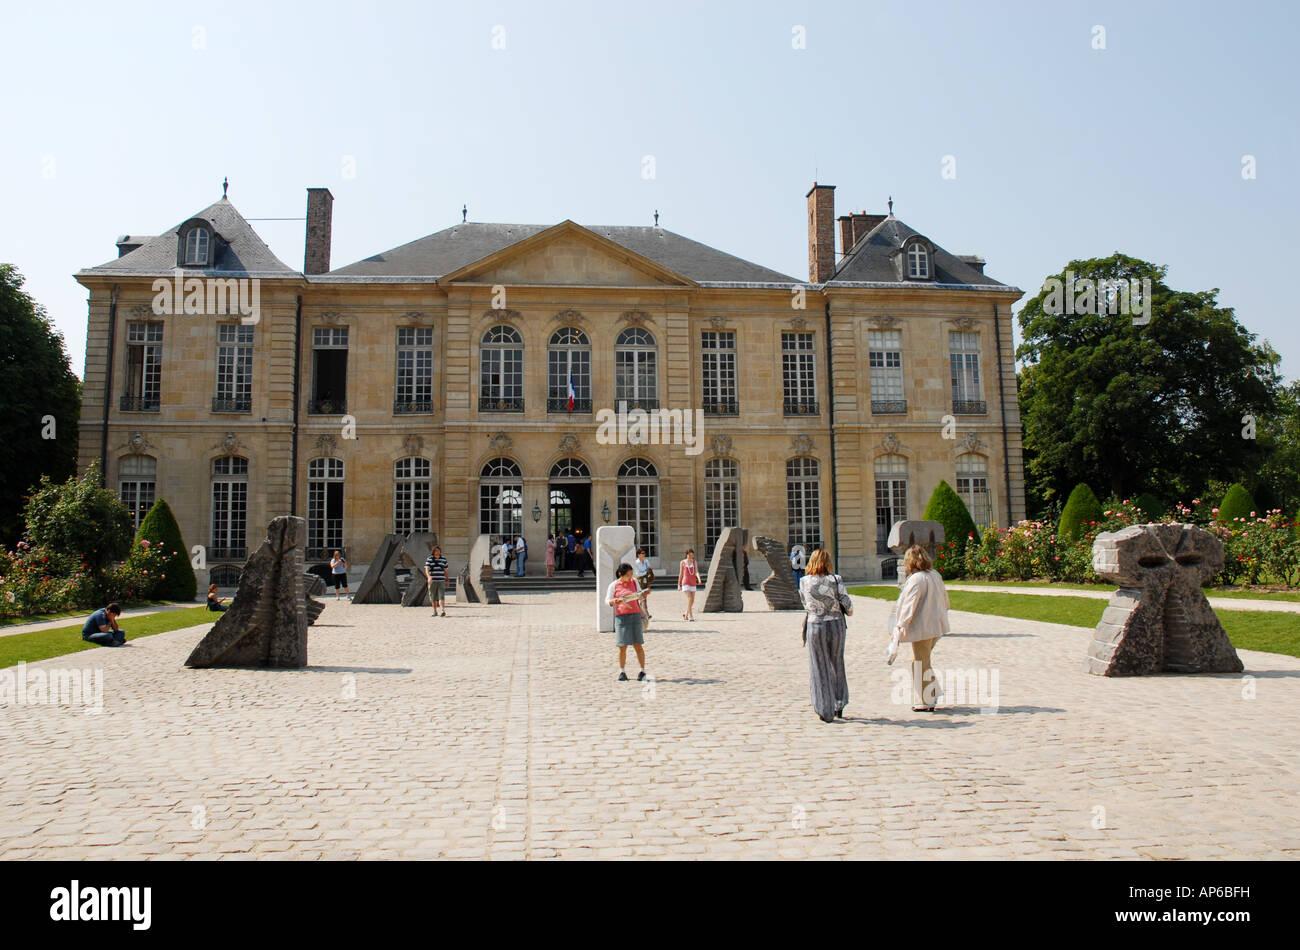 Sculptures By A Visiting Artist Not Rodin At The Museum 79 Rue De Varenne 75007 Paris